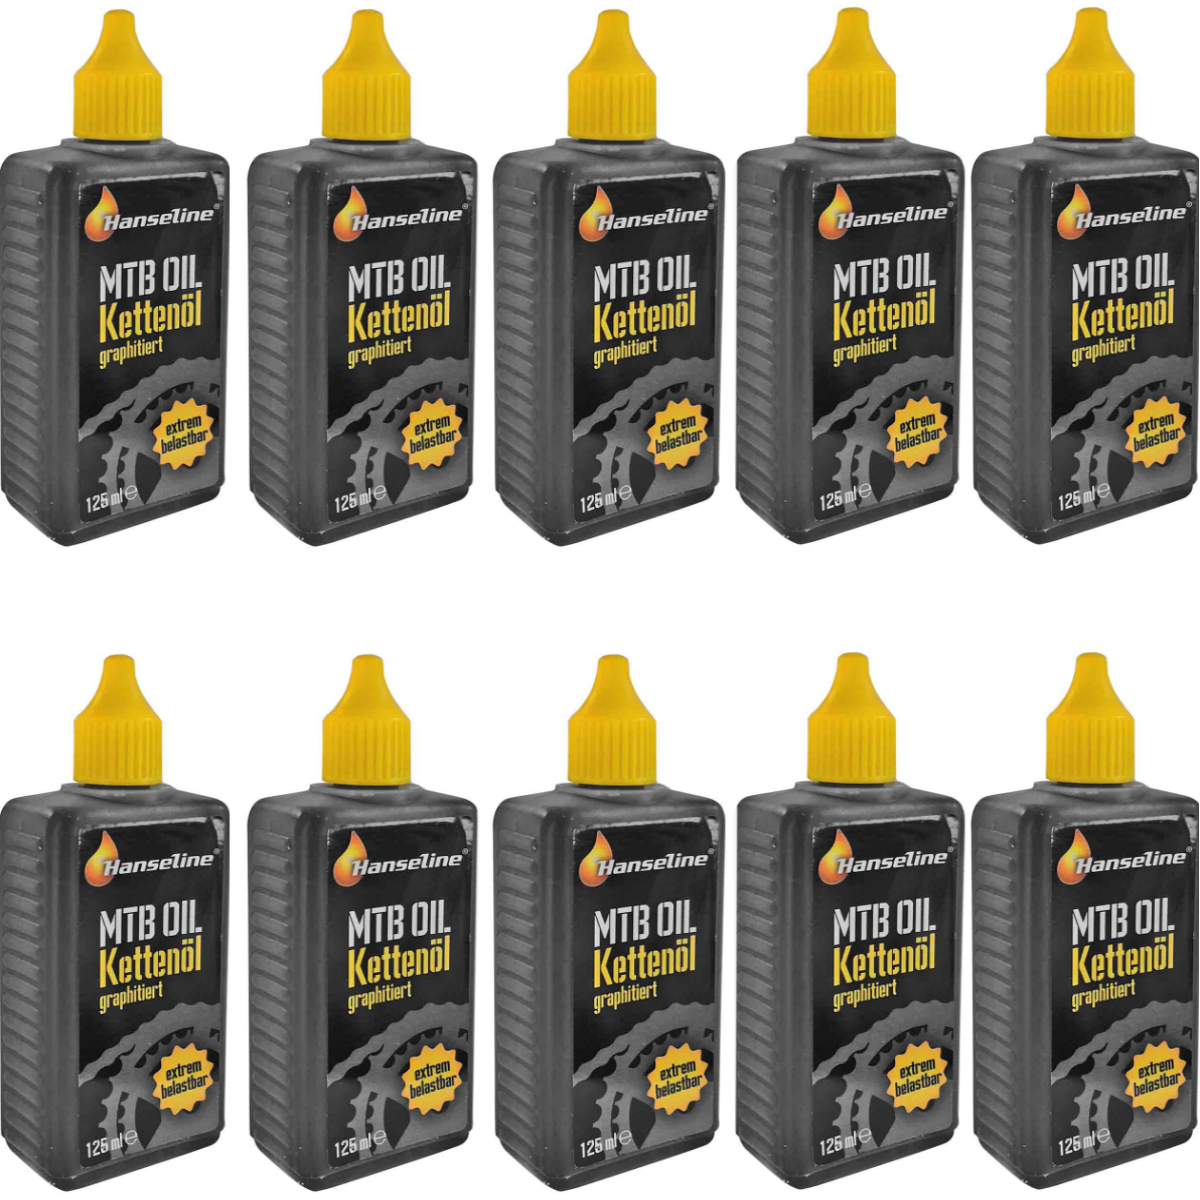 10x Hanseline® Kettenöl Fahrrad 125 ml graphitiert extrem belastbar Graphitöl